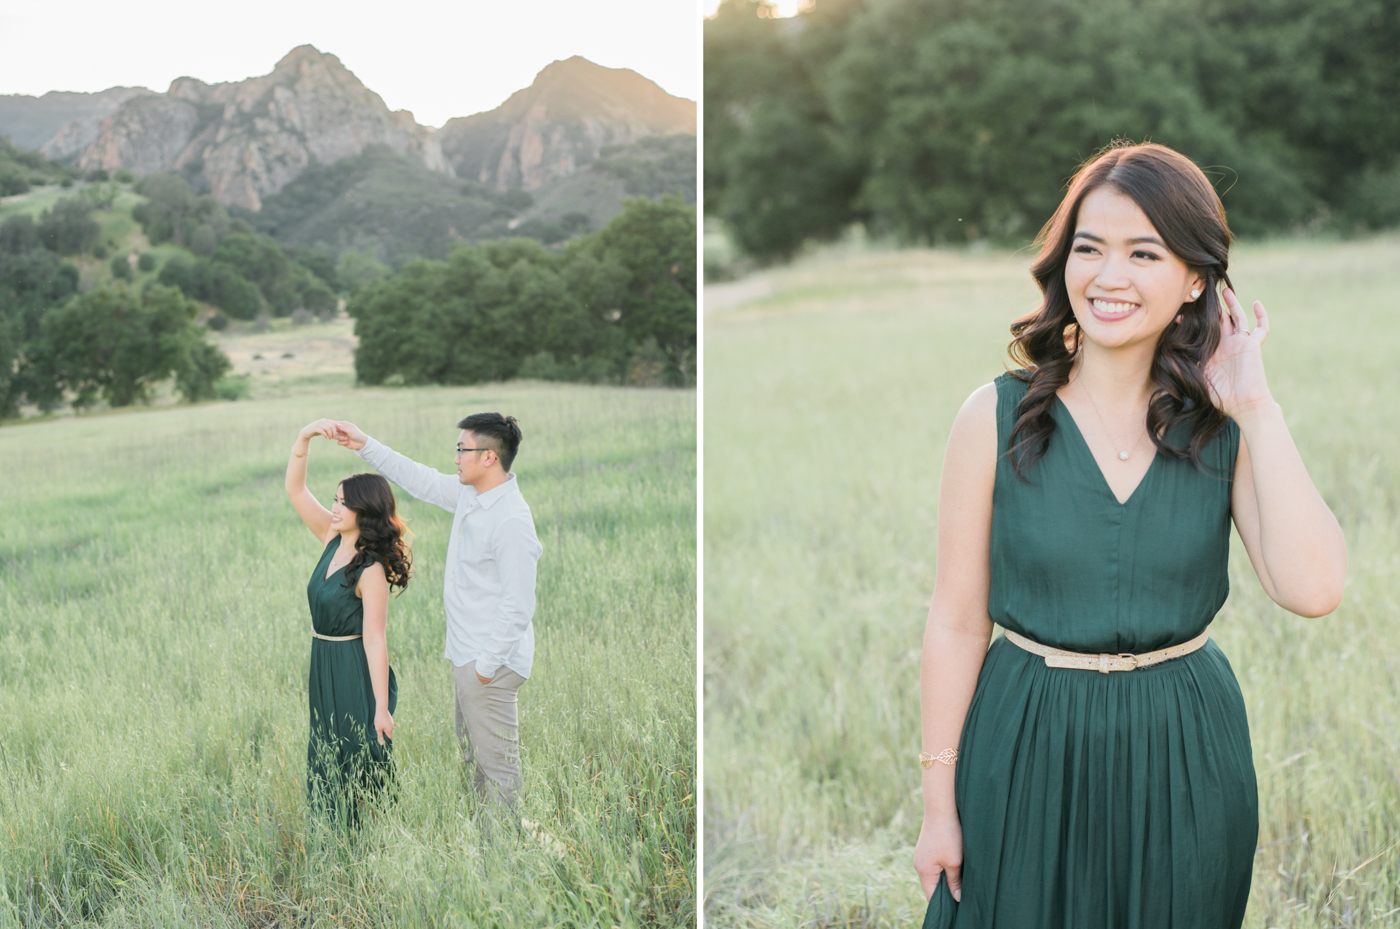 dianne&christian-malibu-creek-state-park-engagement-session-photography-los-angeles-based-wedding-photographer-9.jpg